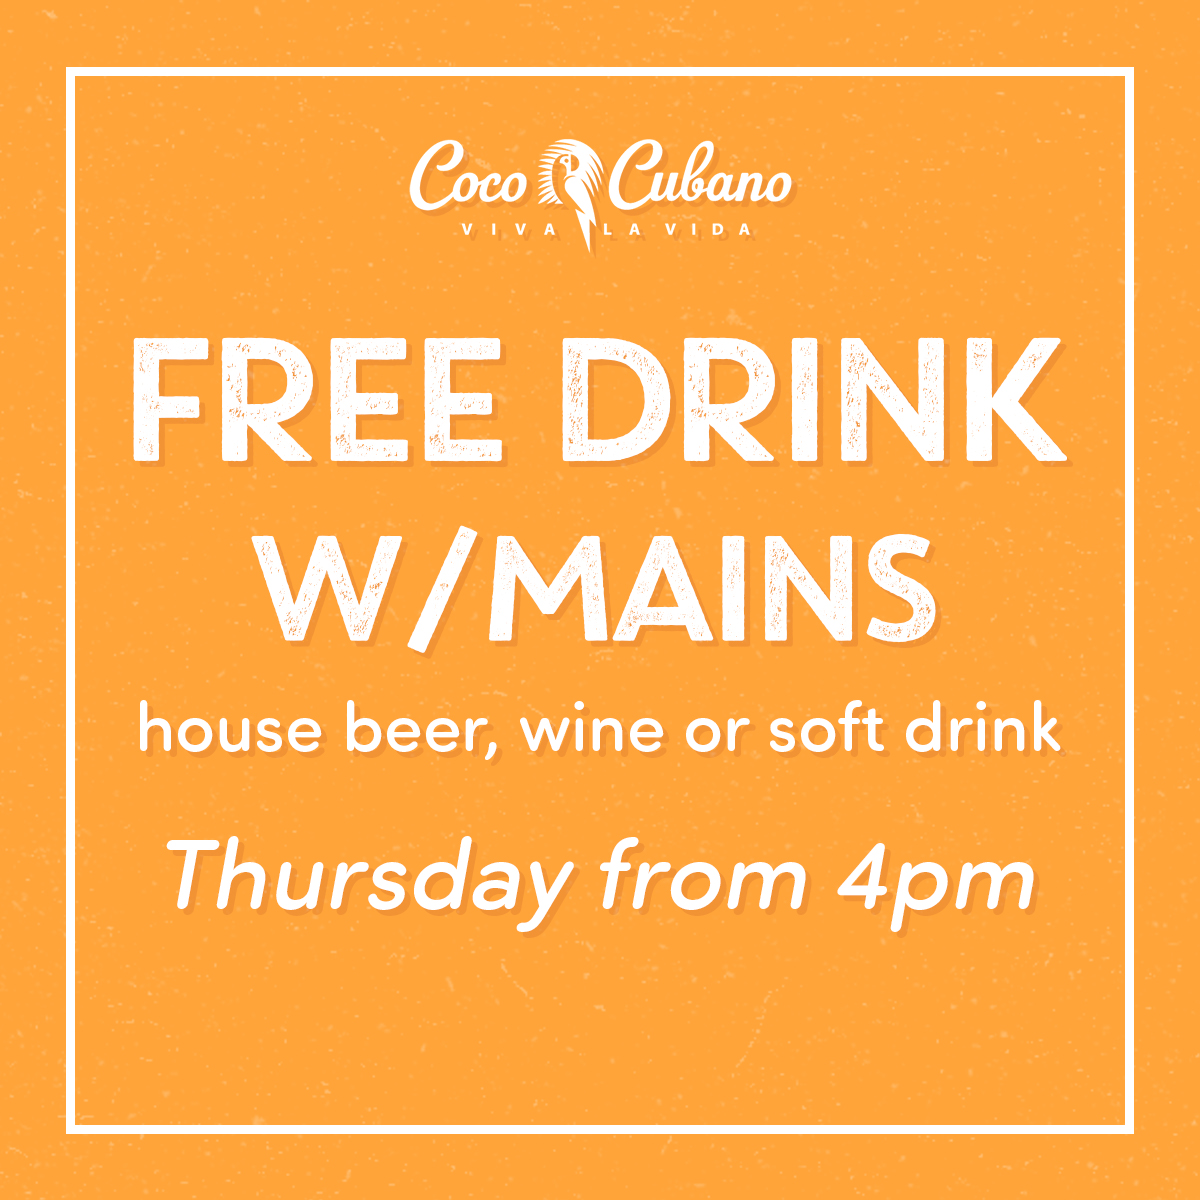 THURSDAY-free drink w_mains.jpg.jpg